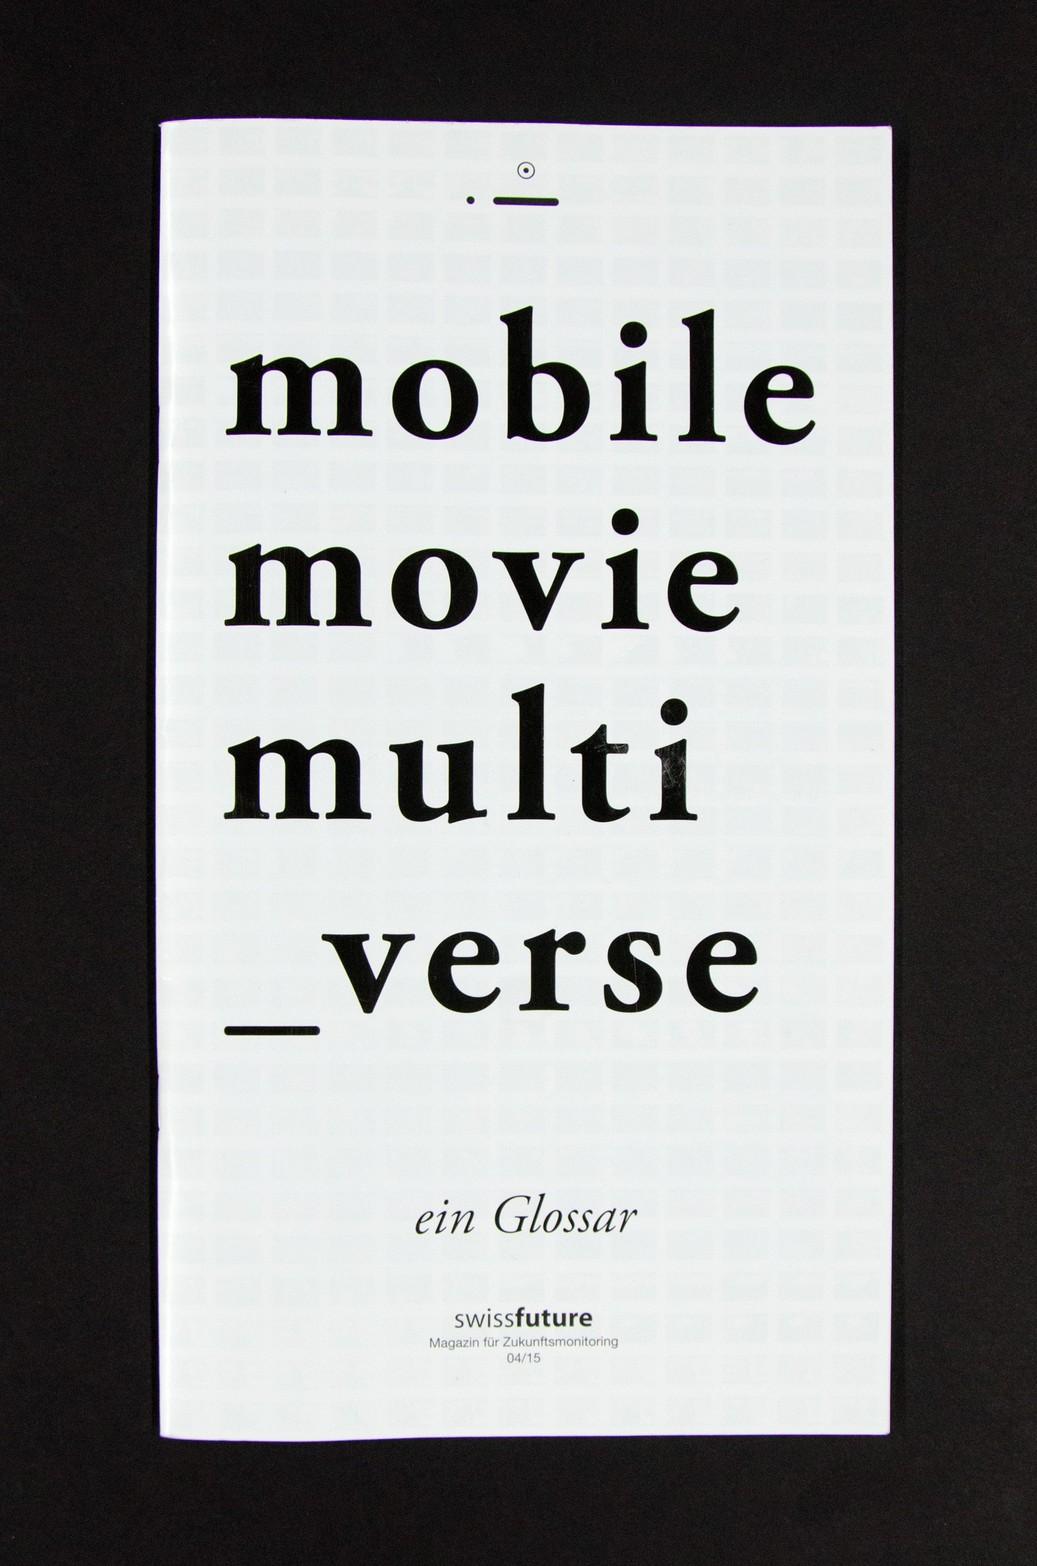 cover.jpg.2048x1566_q90 2.jpg